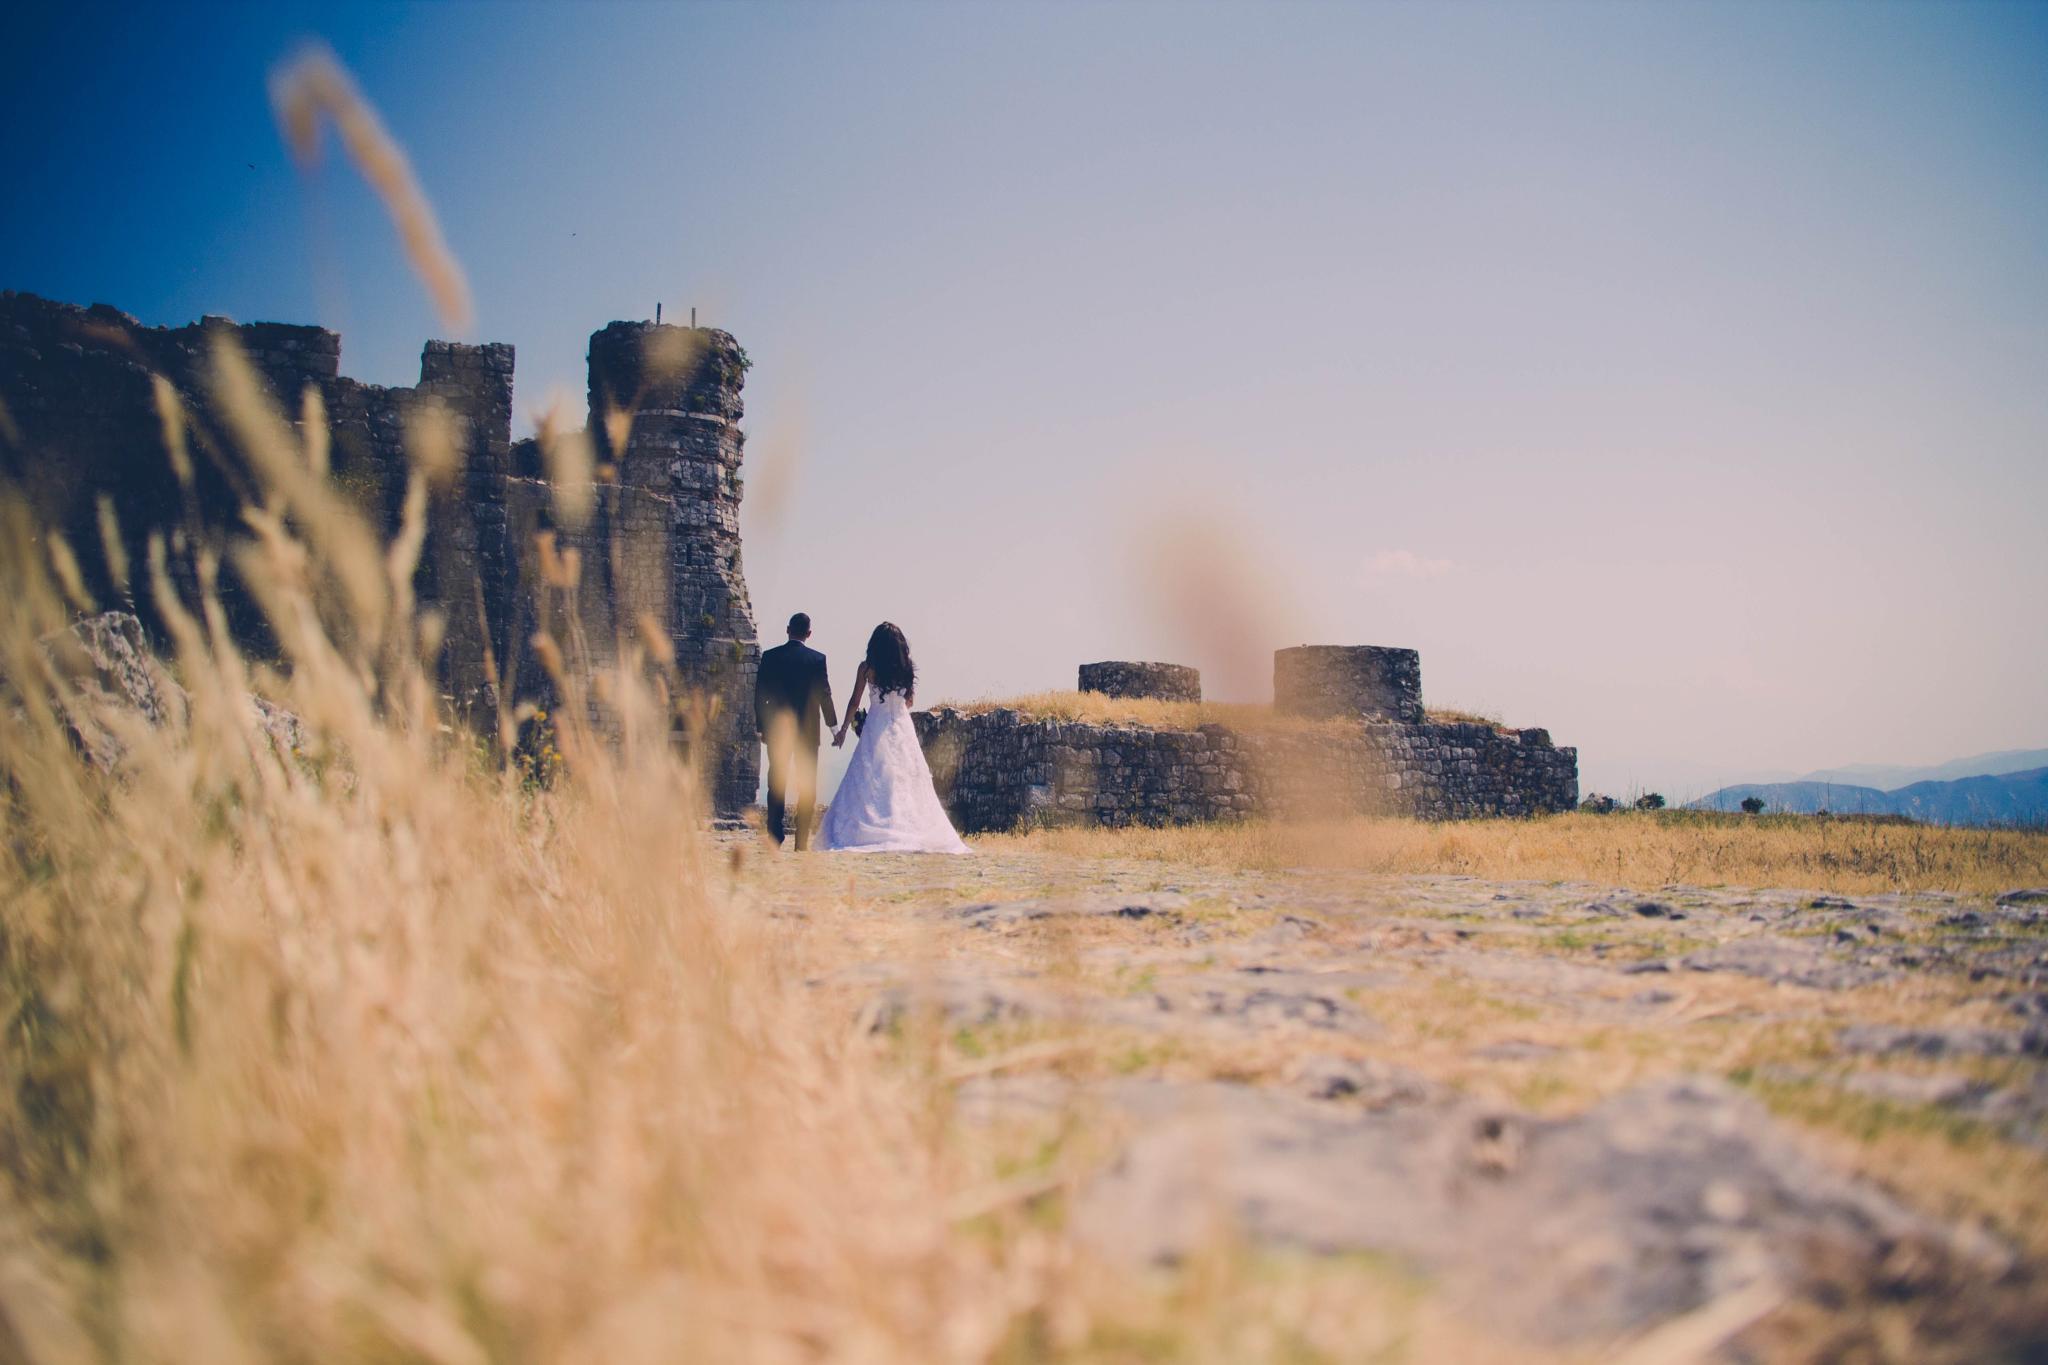 Wedding Day by EraldDeda